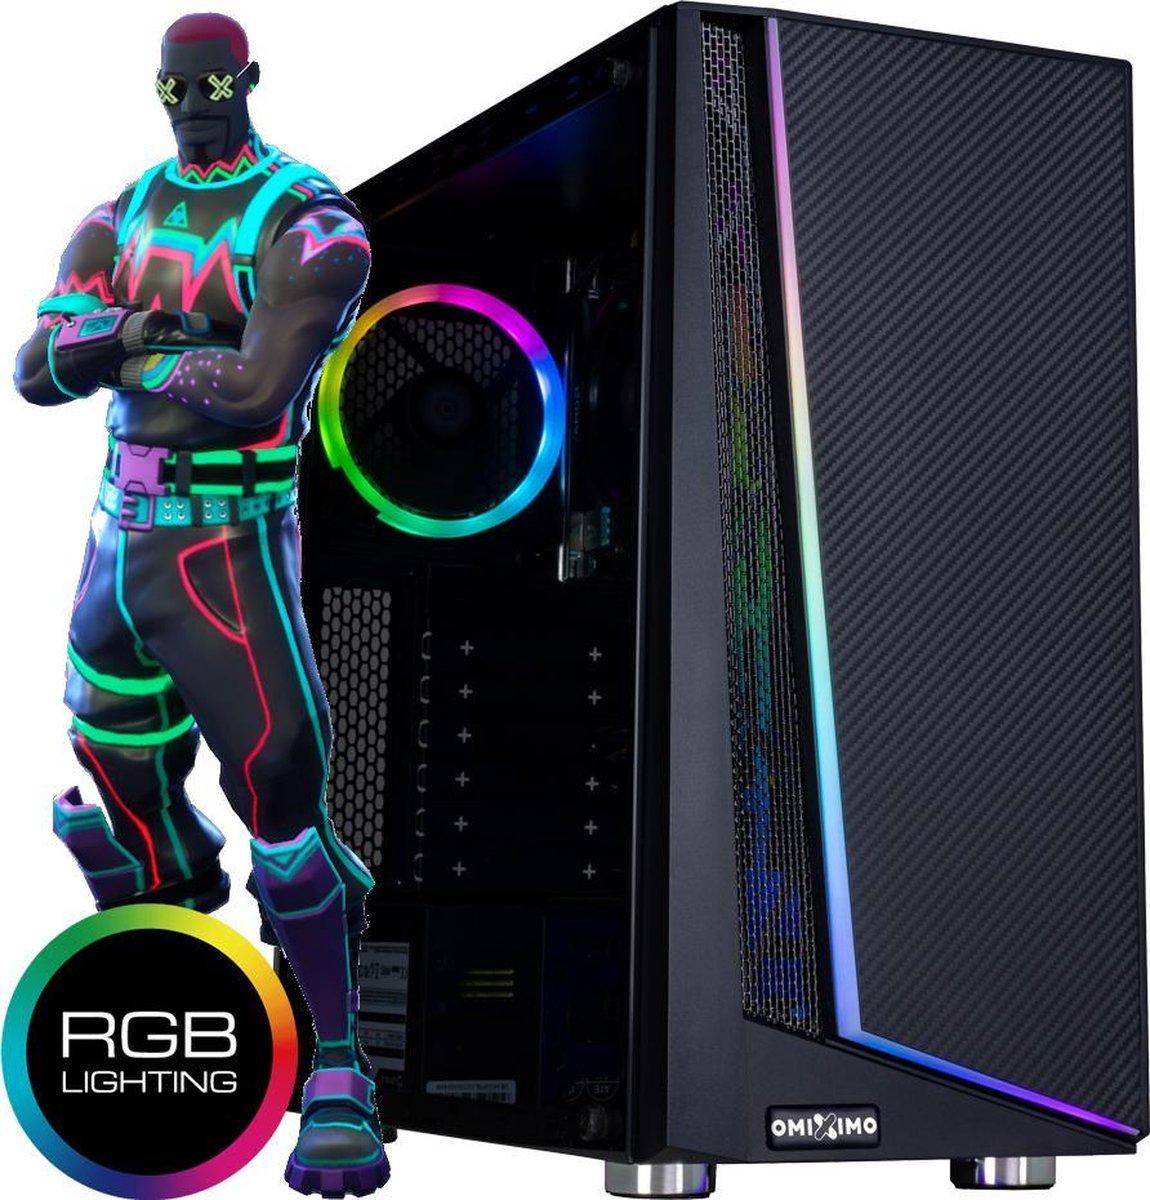 omiXimo| Gaming PC | Intel Geforce GTX1030  | 8 GB Ram | 240 GB SSD | Fortnite 144 FPS